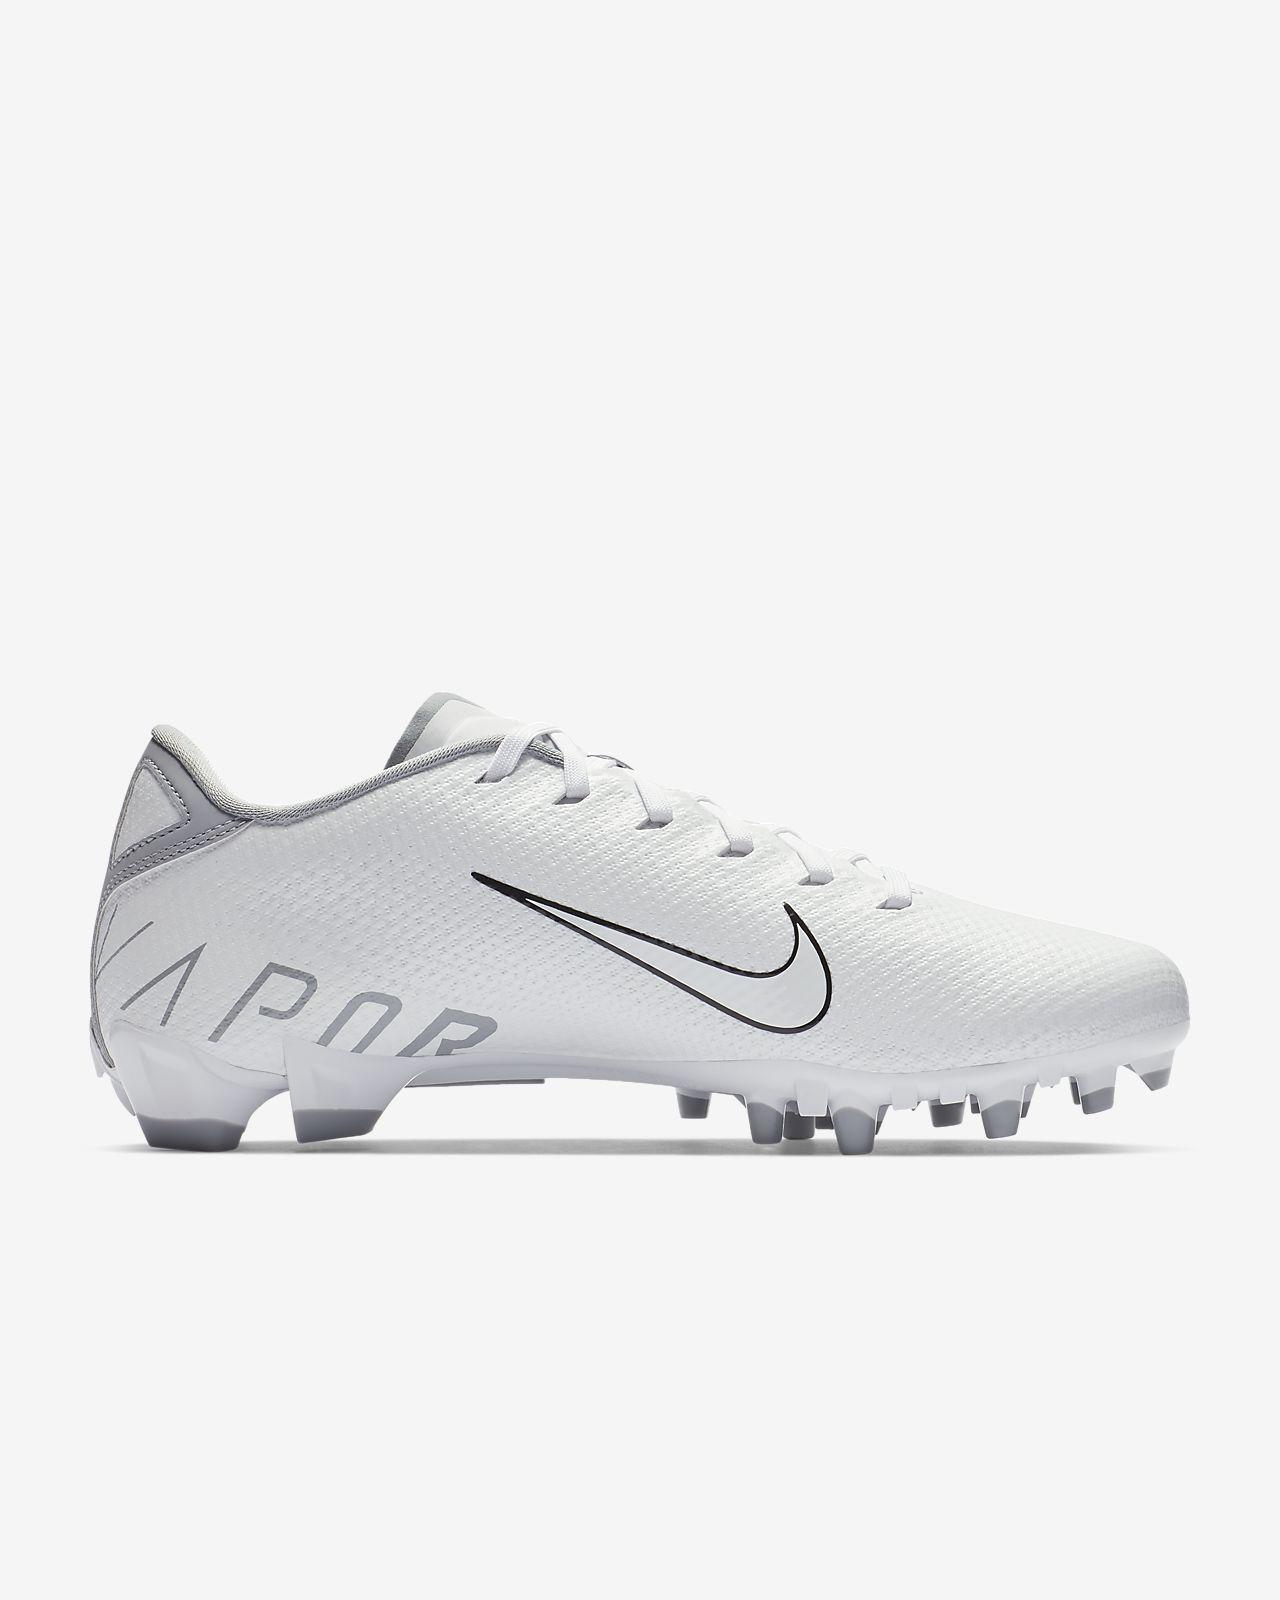 0d558f6d0387c2 Nike Vapor Untouchable 3 Speed Men s Football Cleat. Nike.com